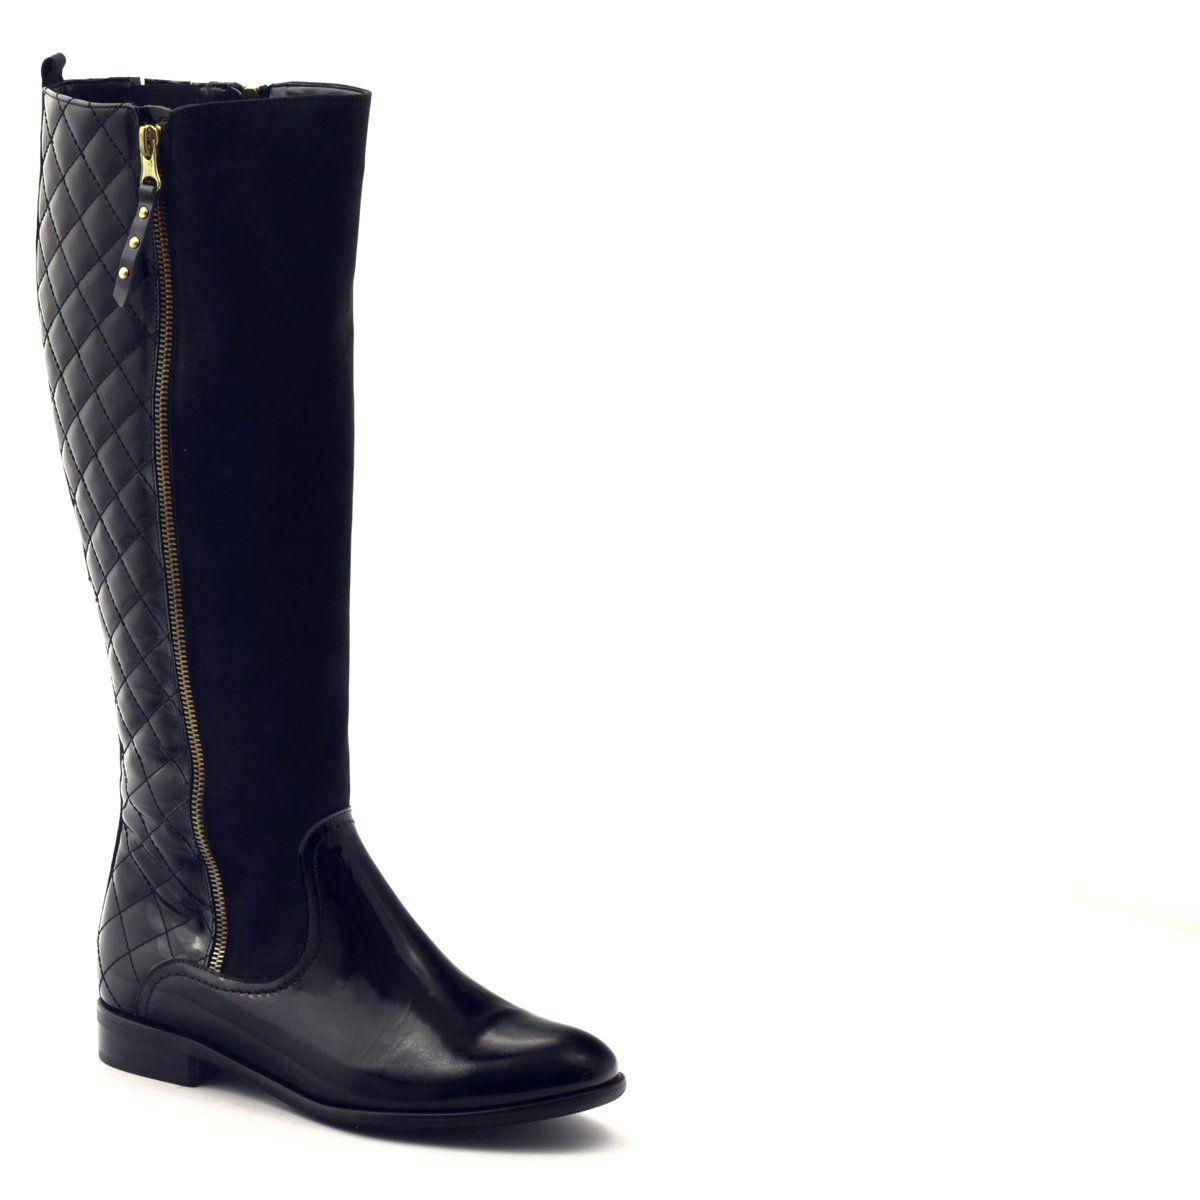 Kozaki Buty Damskie Lakierowane Pikowane 1800 Czarne Riding Boots Boots Shoes